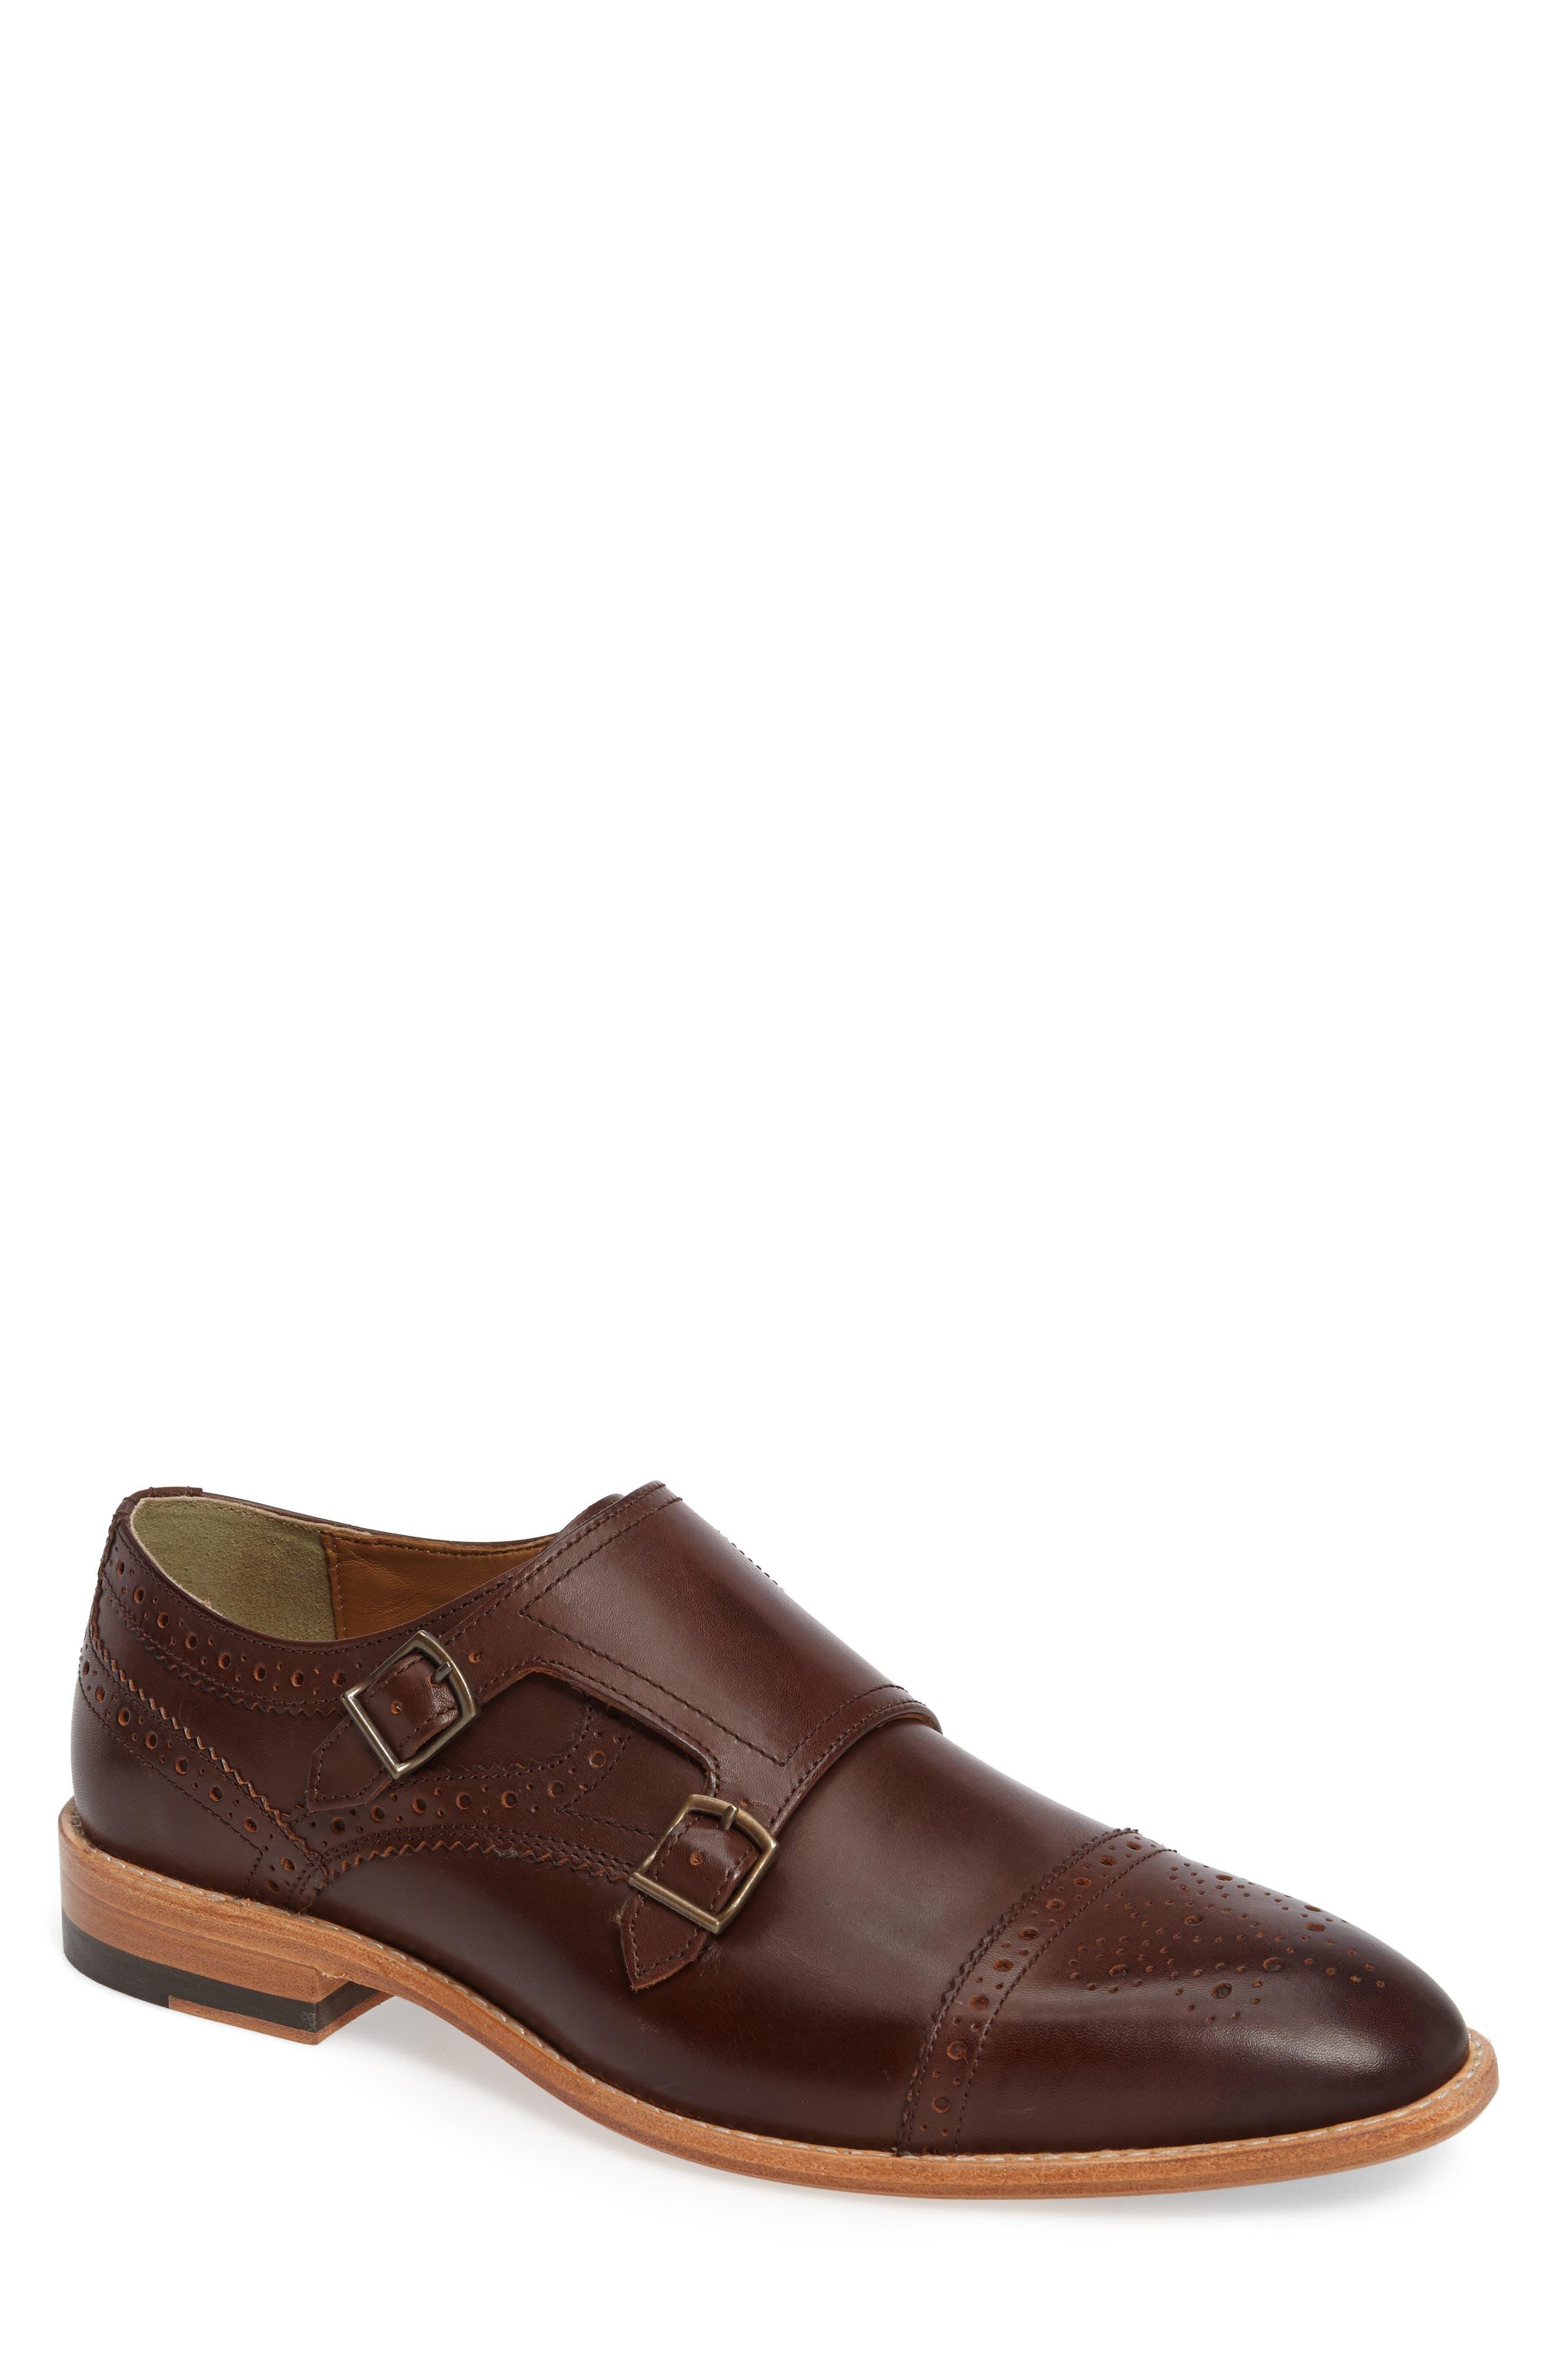 J&M 1850 Vance Cap Toe Monk Shoe